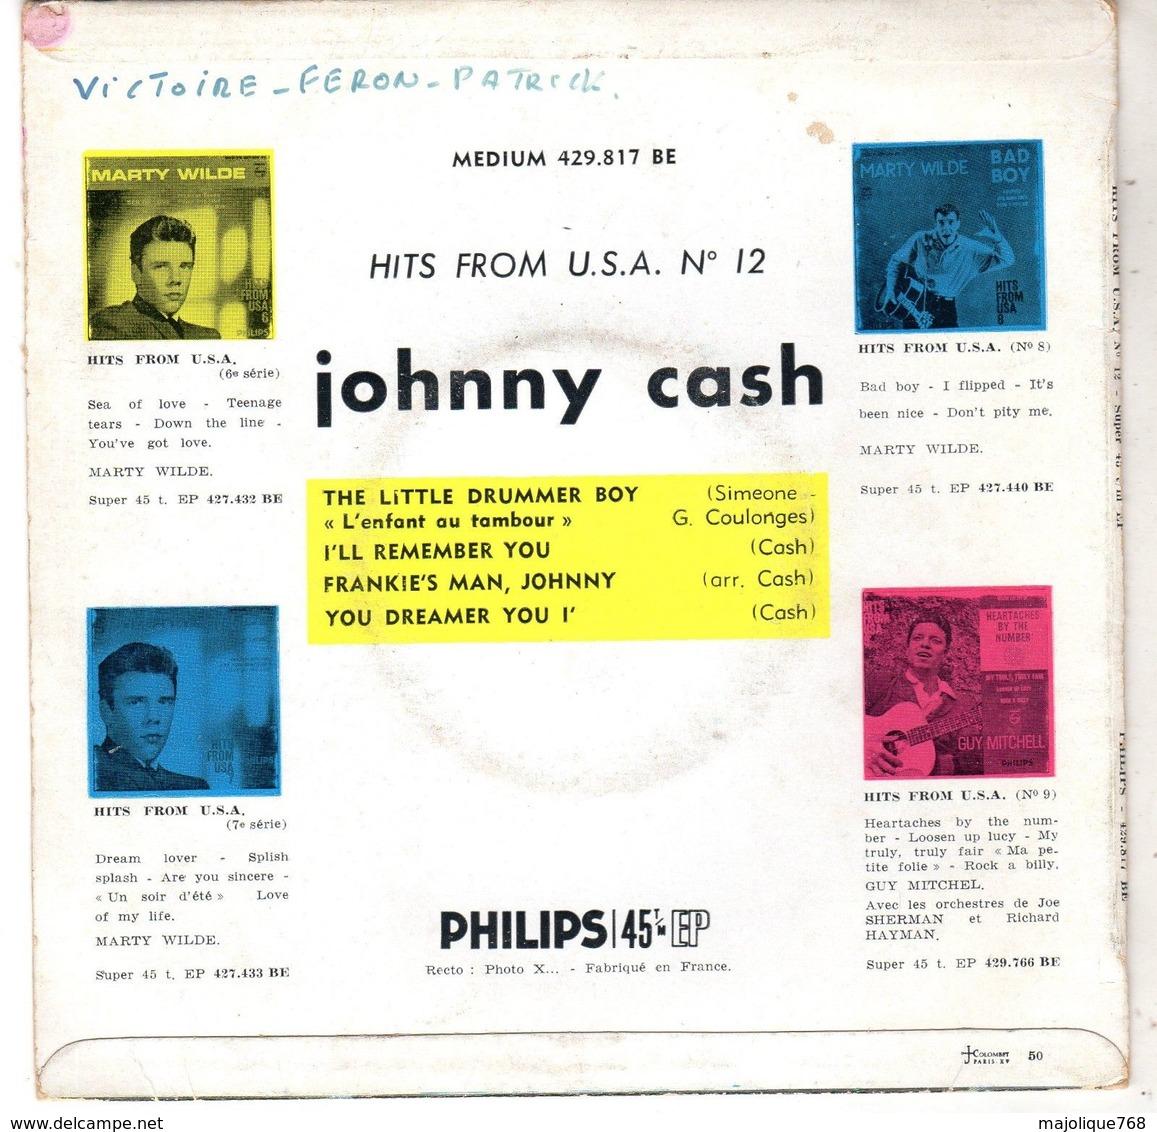 Disque De Johnny Cash - The Little Drummer Boy - Philips 429817 BE - 1959 - Country & Folk